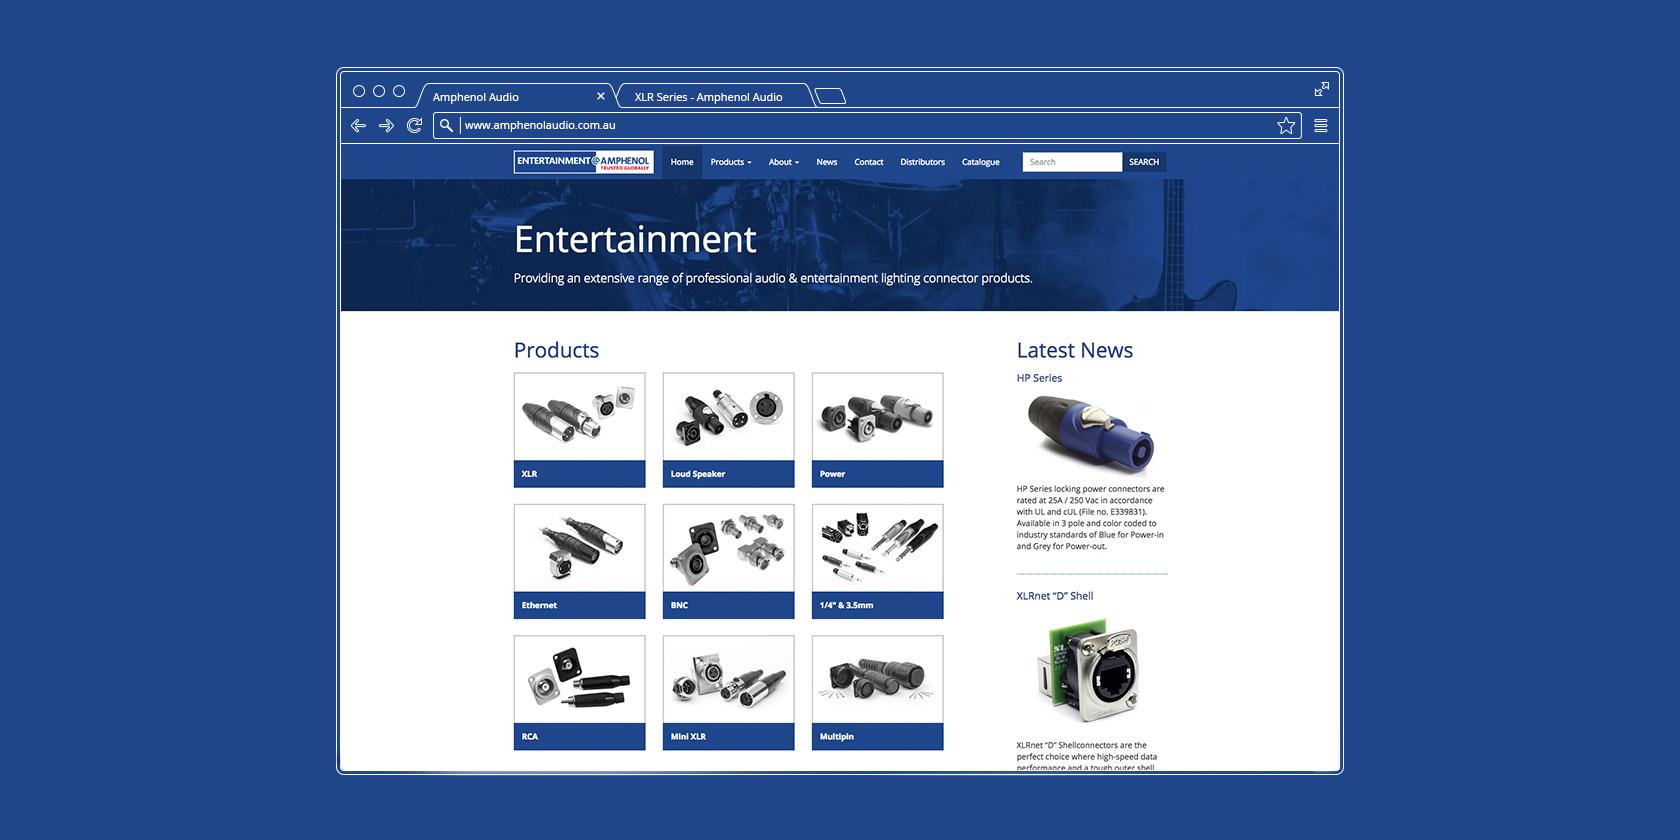 Amphenol Audio Website 0